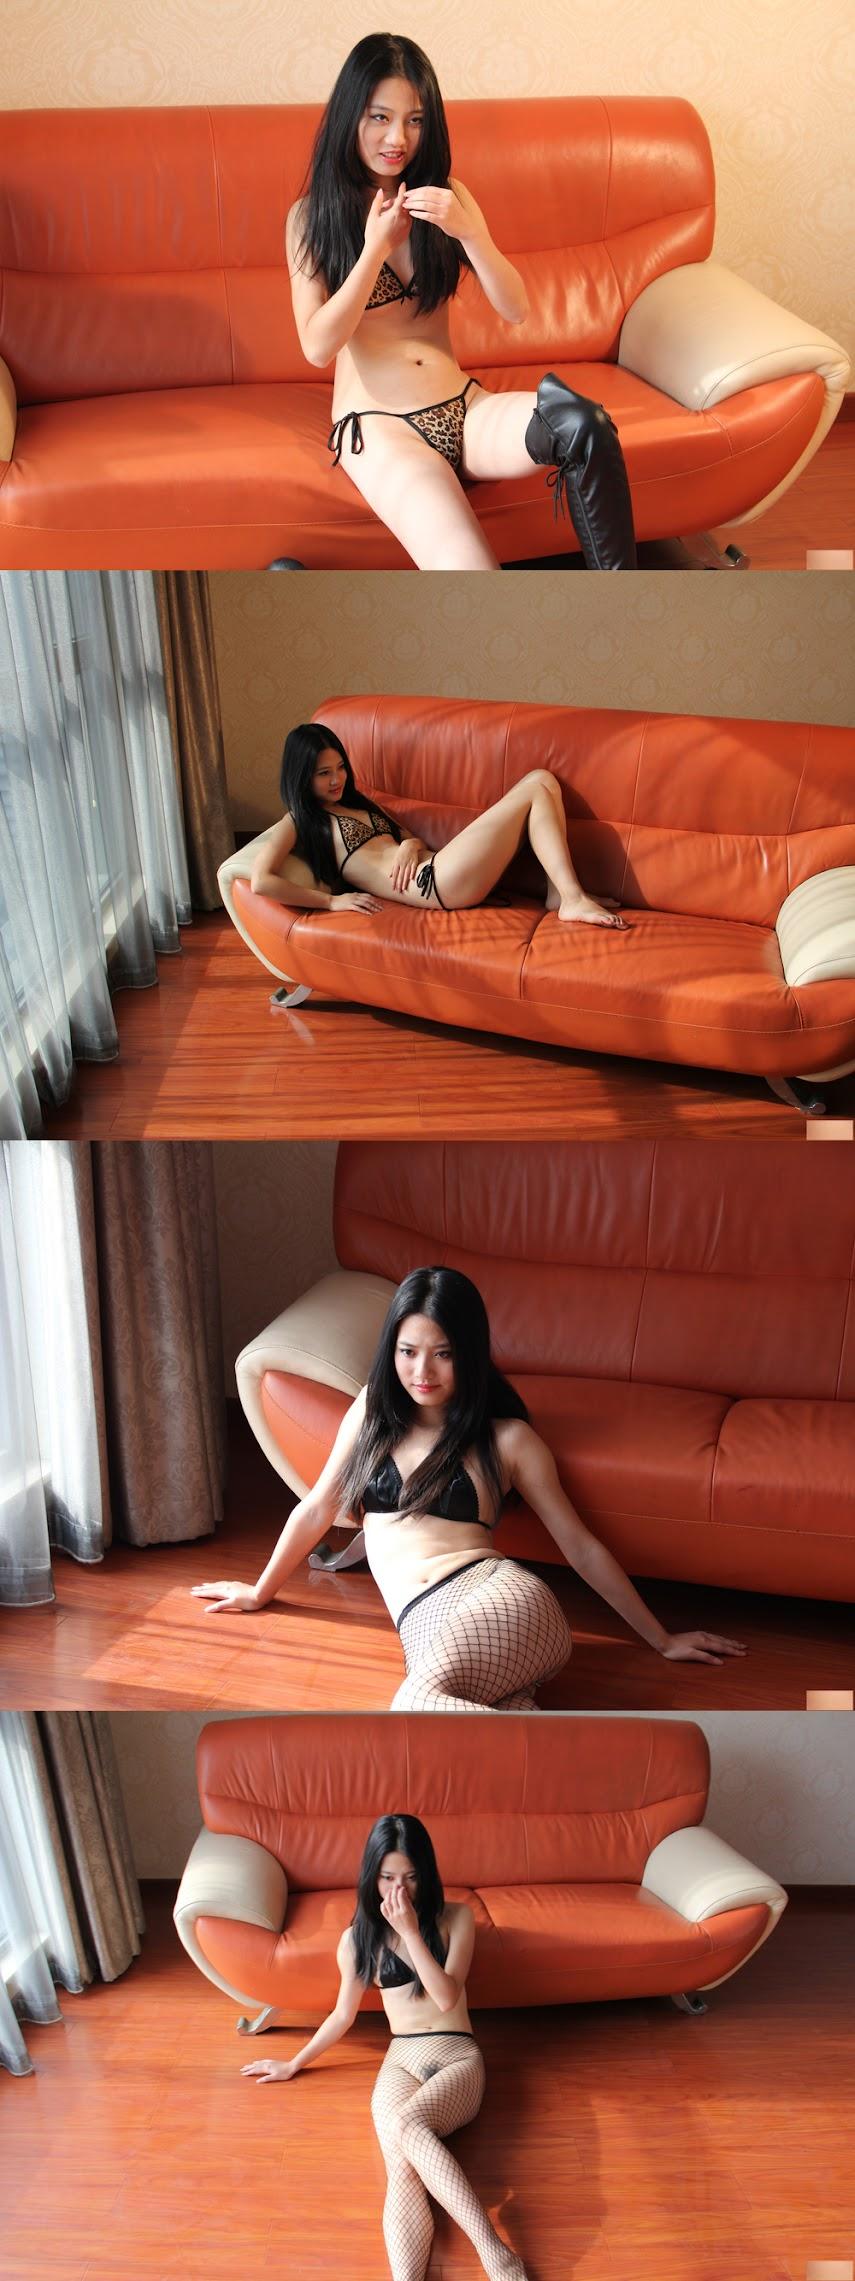 Asian 9080兰静2013.04.25(S).part1 asian 07050